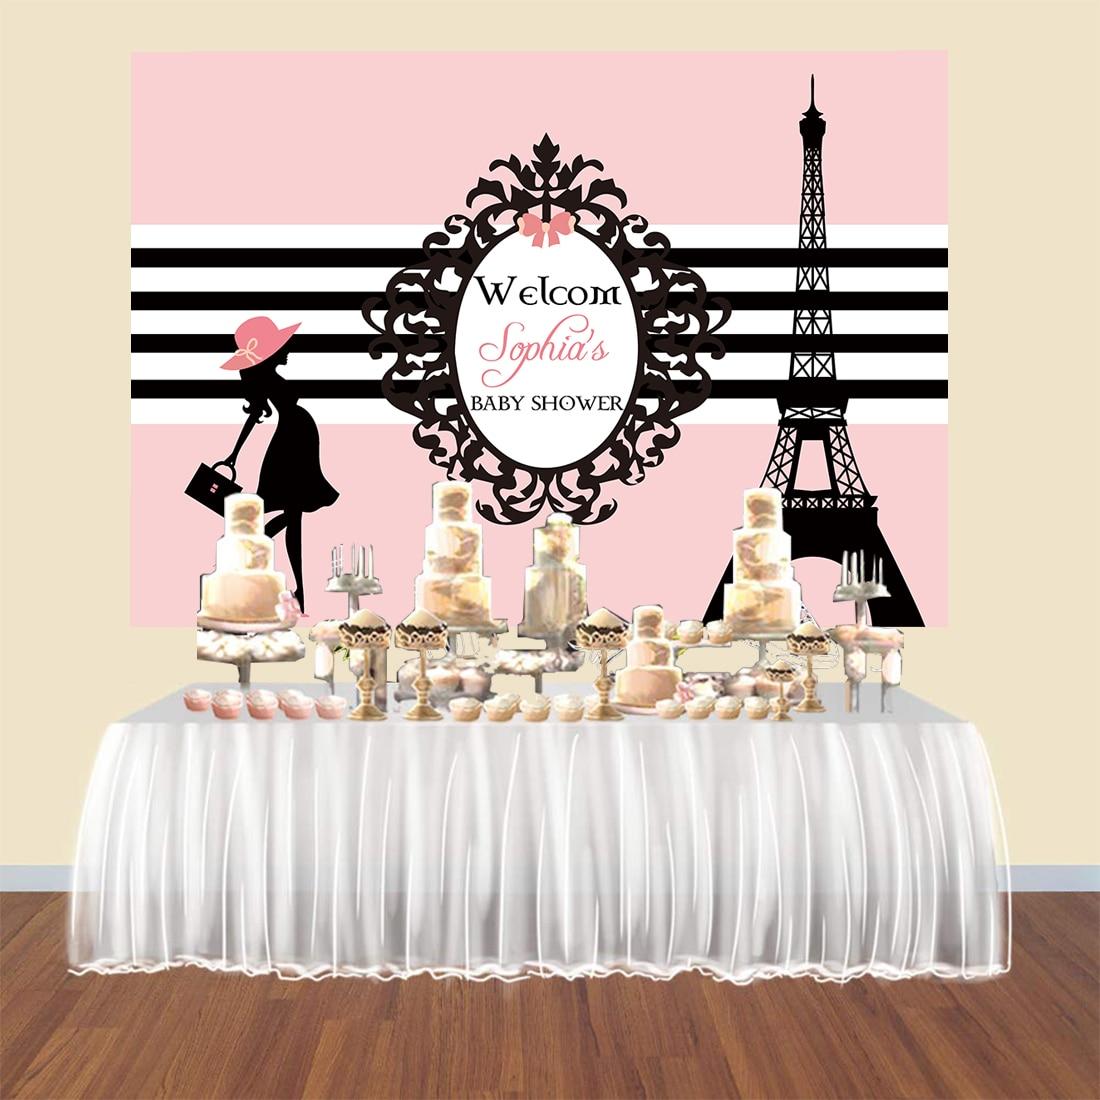 Parisino París temática fiesta baby shower telón de fondo Torre Eiffel Rosa Fondo banner cartel coustom candy Mesa postre vinilo